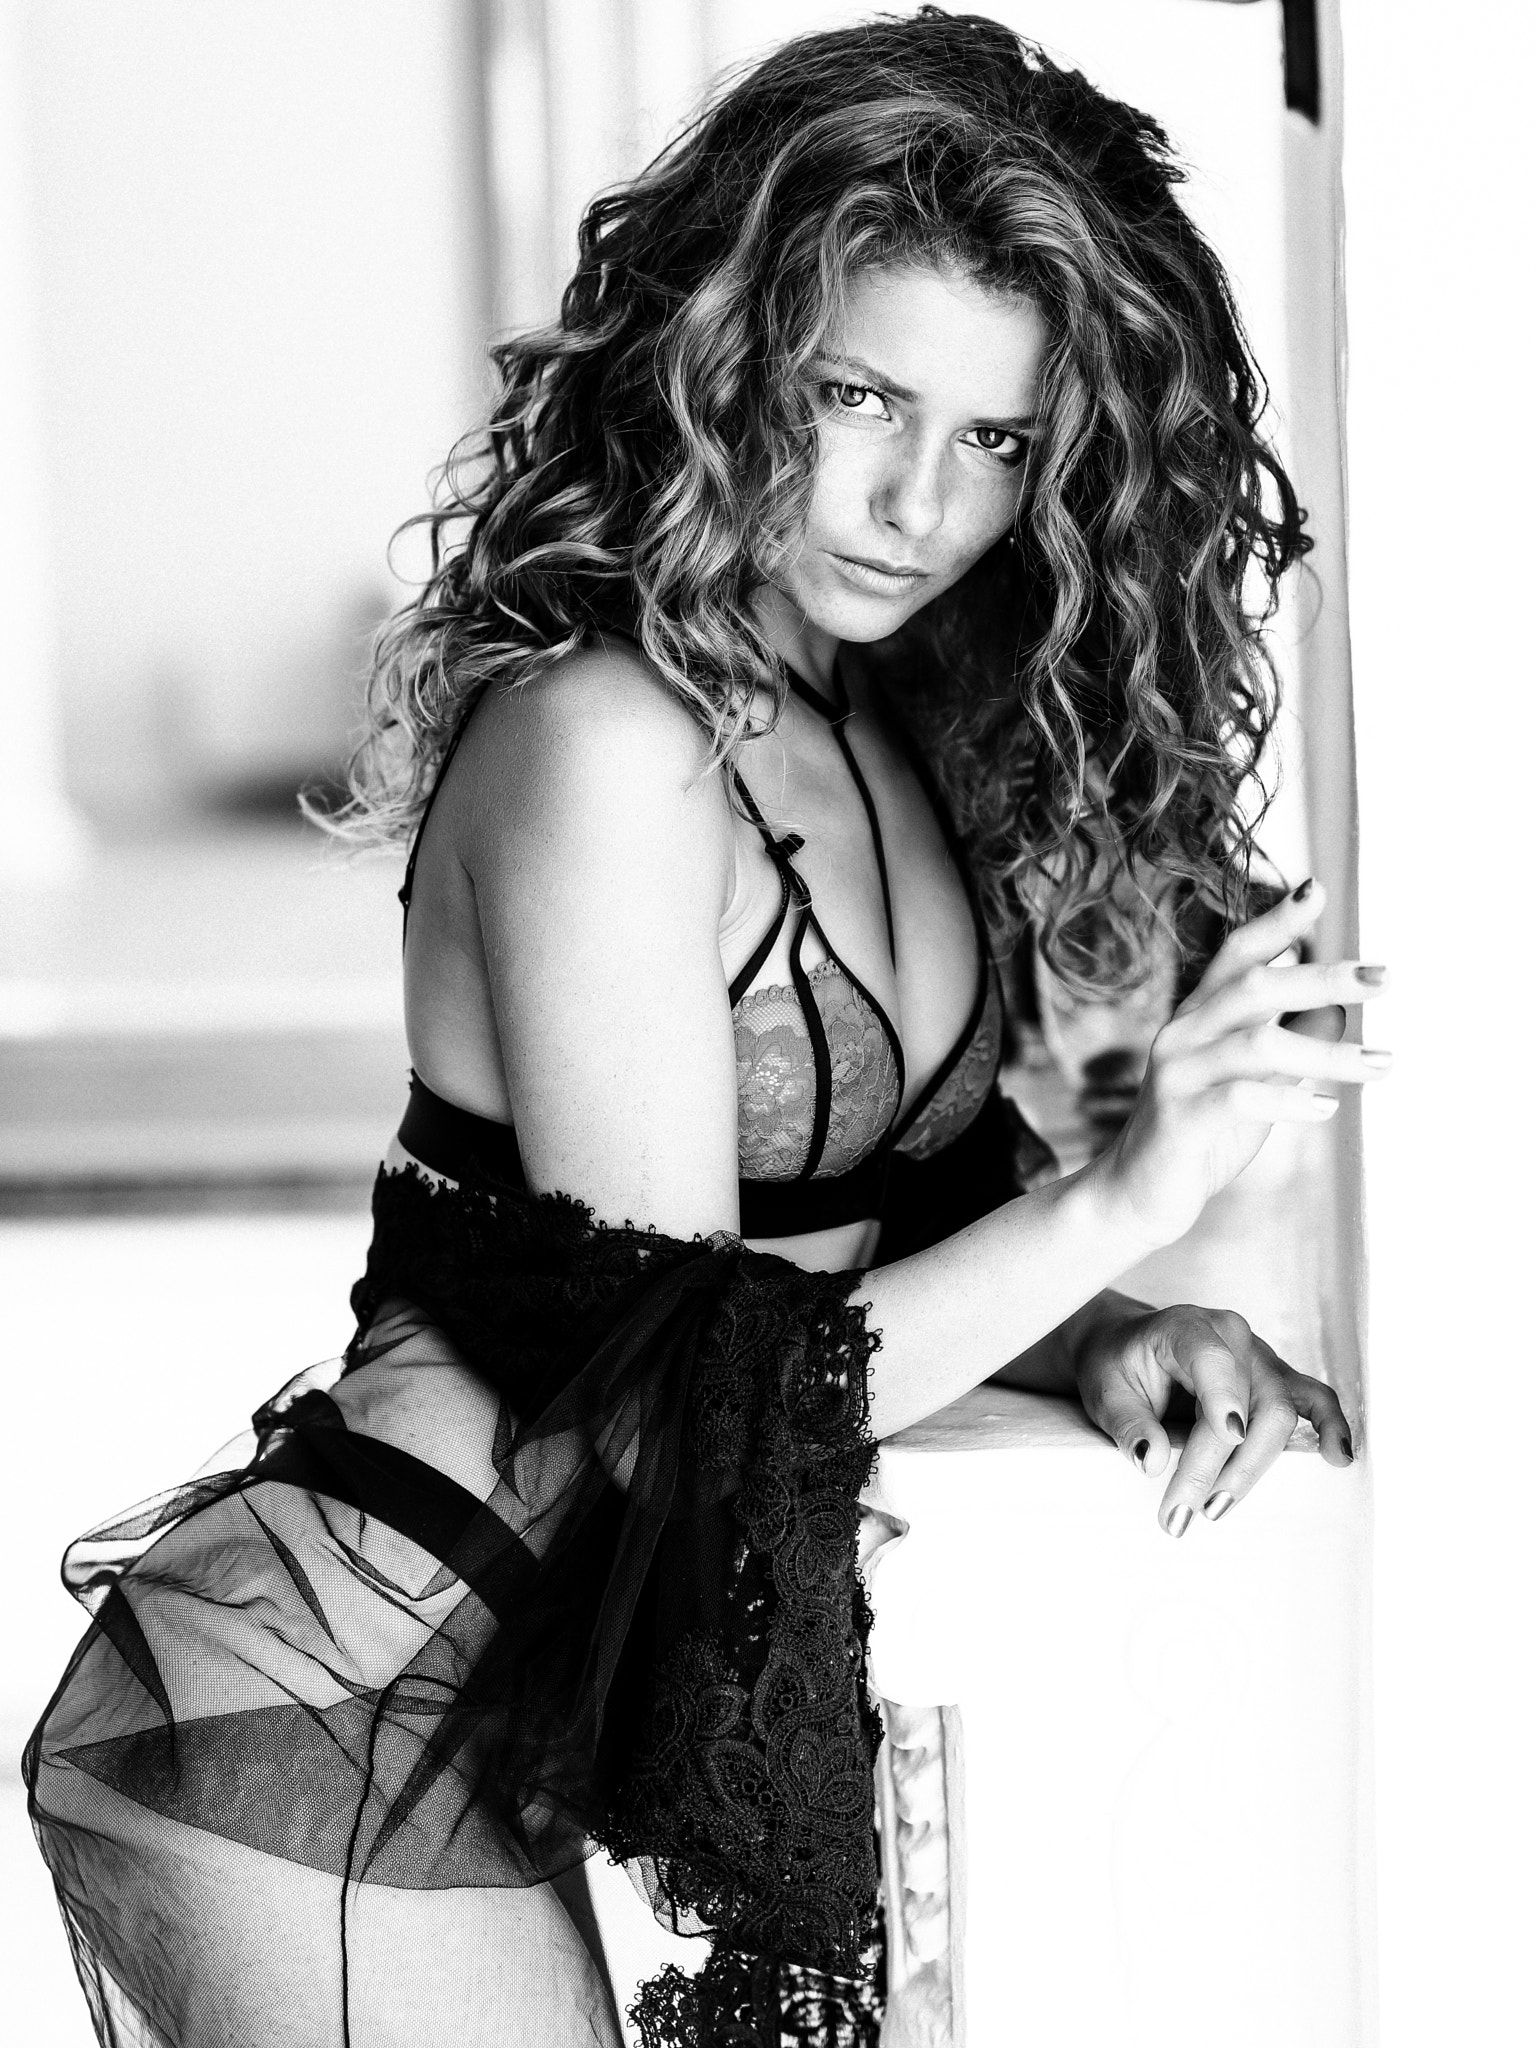 Paparazzi Julia Yaroshenko nudes (17 photo), Pussy, Fappening, Selfie, braless 2006